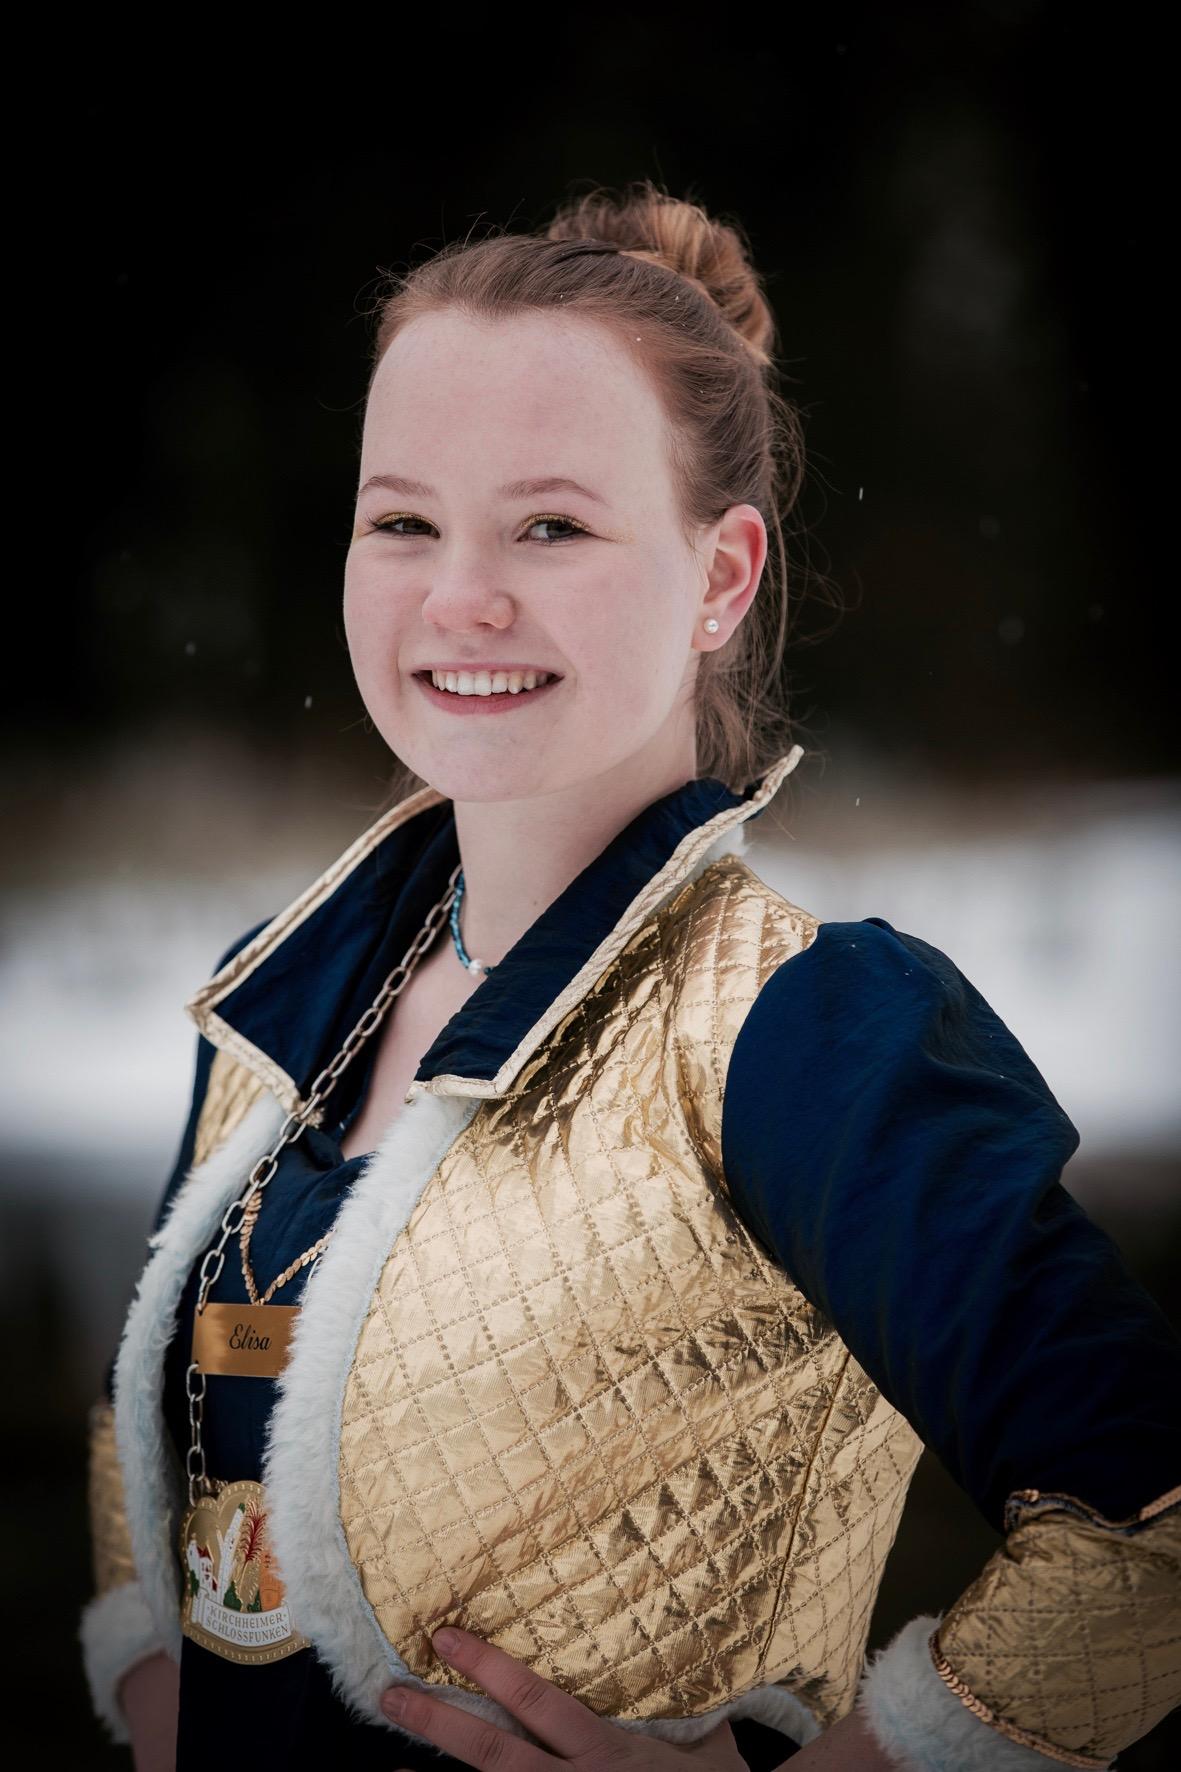 Elisa Sirch